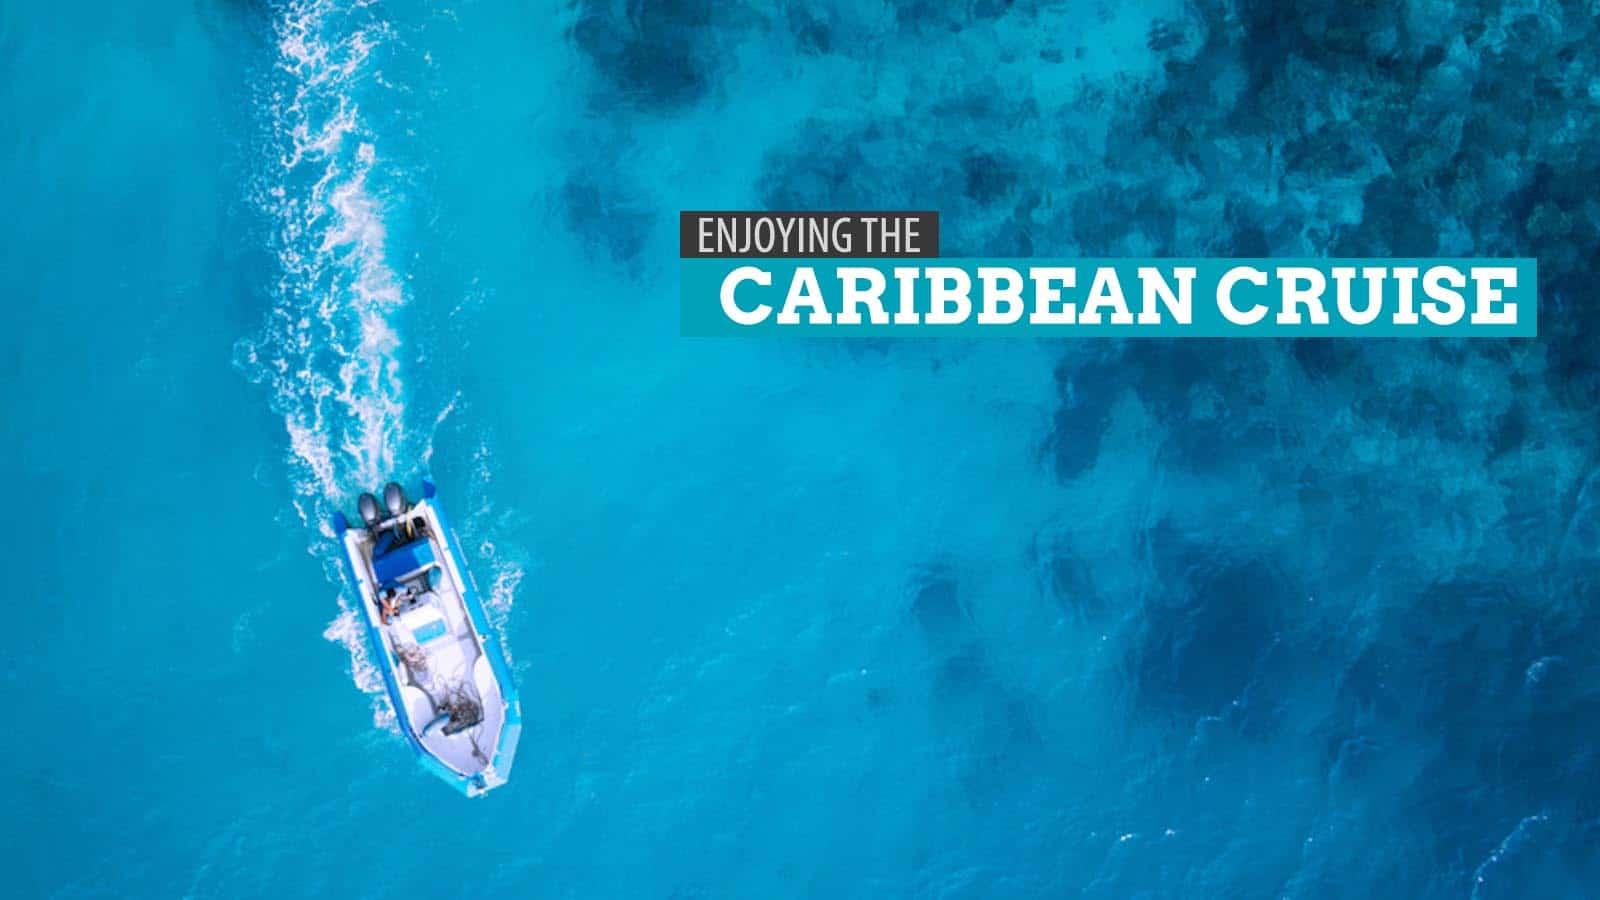 Enjoying the Caribbean by Cruise